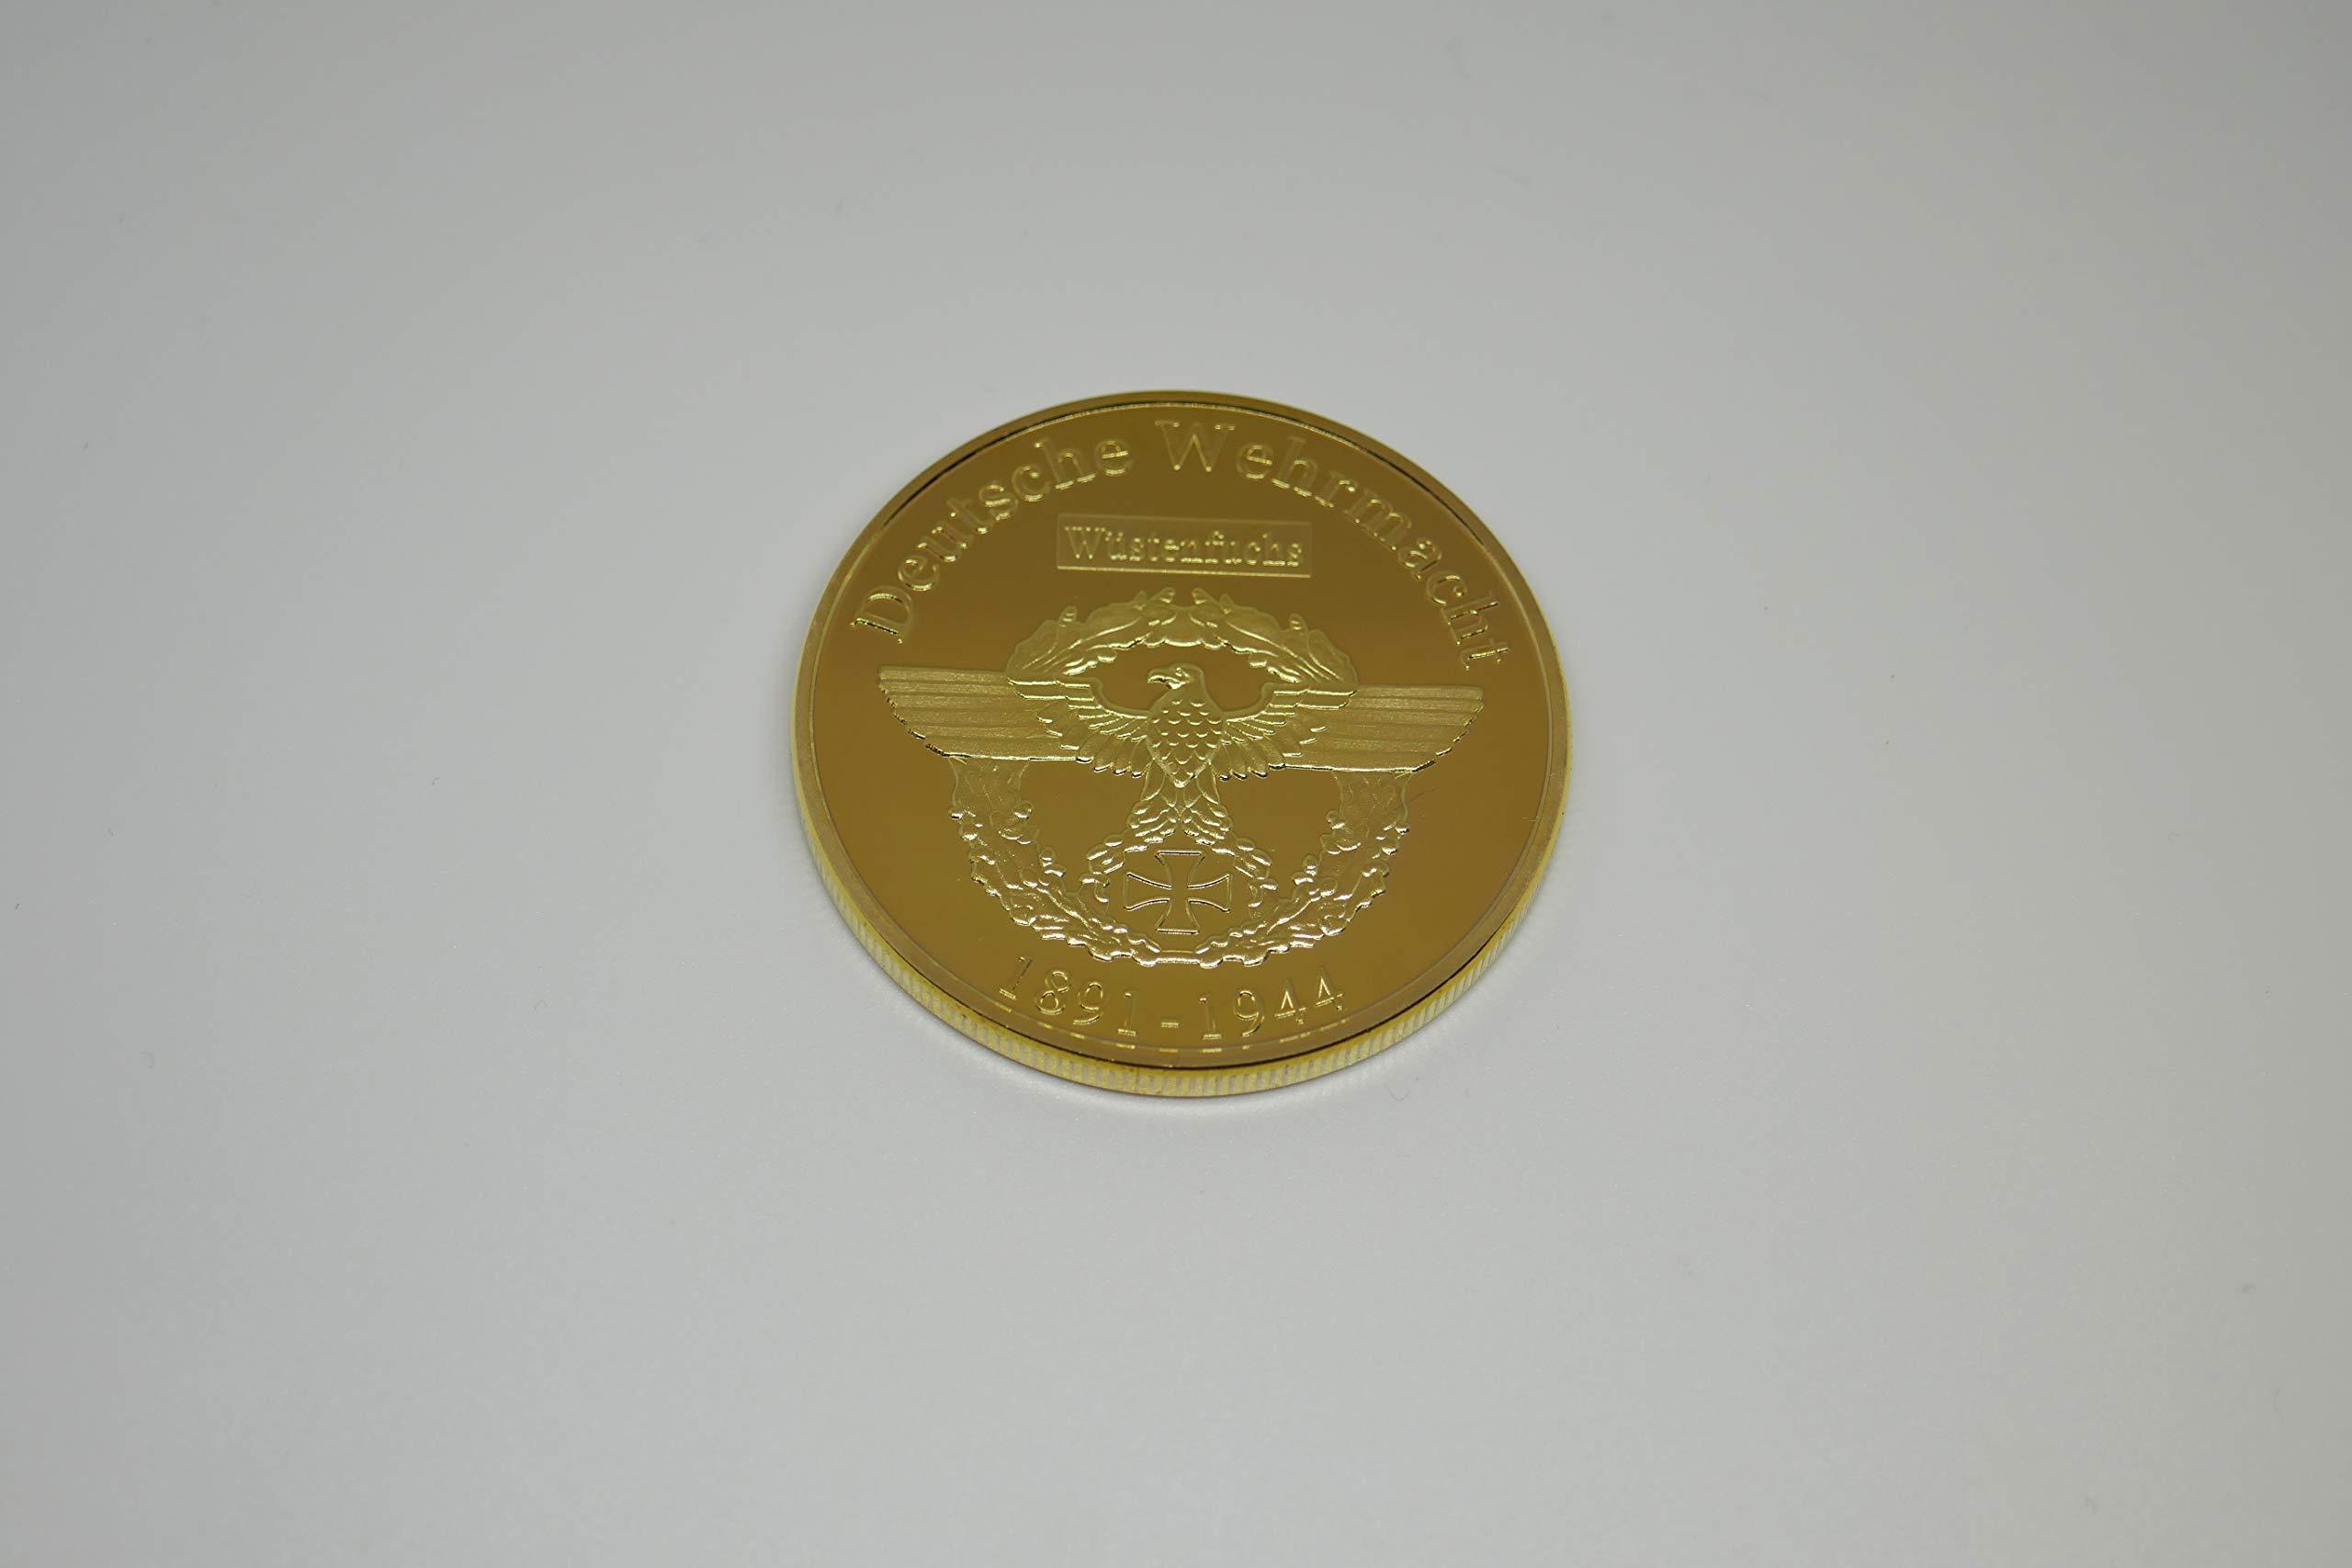 Donatio Commander Erwin Rommel Afrika Korps - Moneda Conmemorativa ...